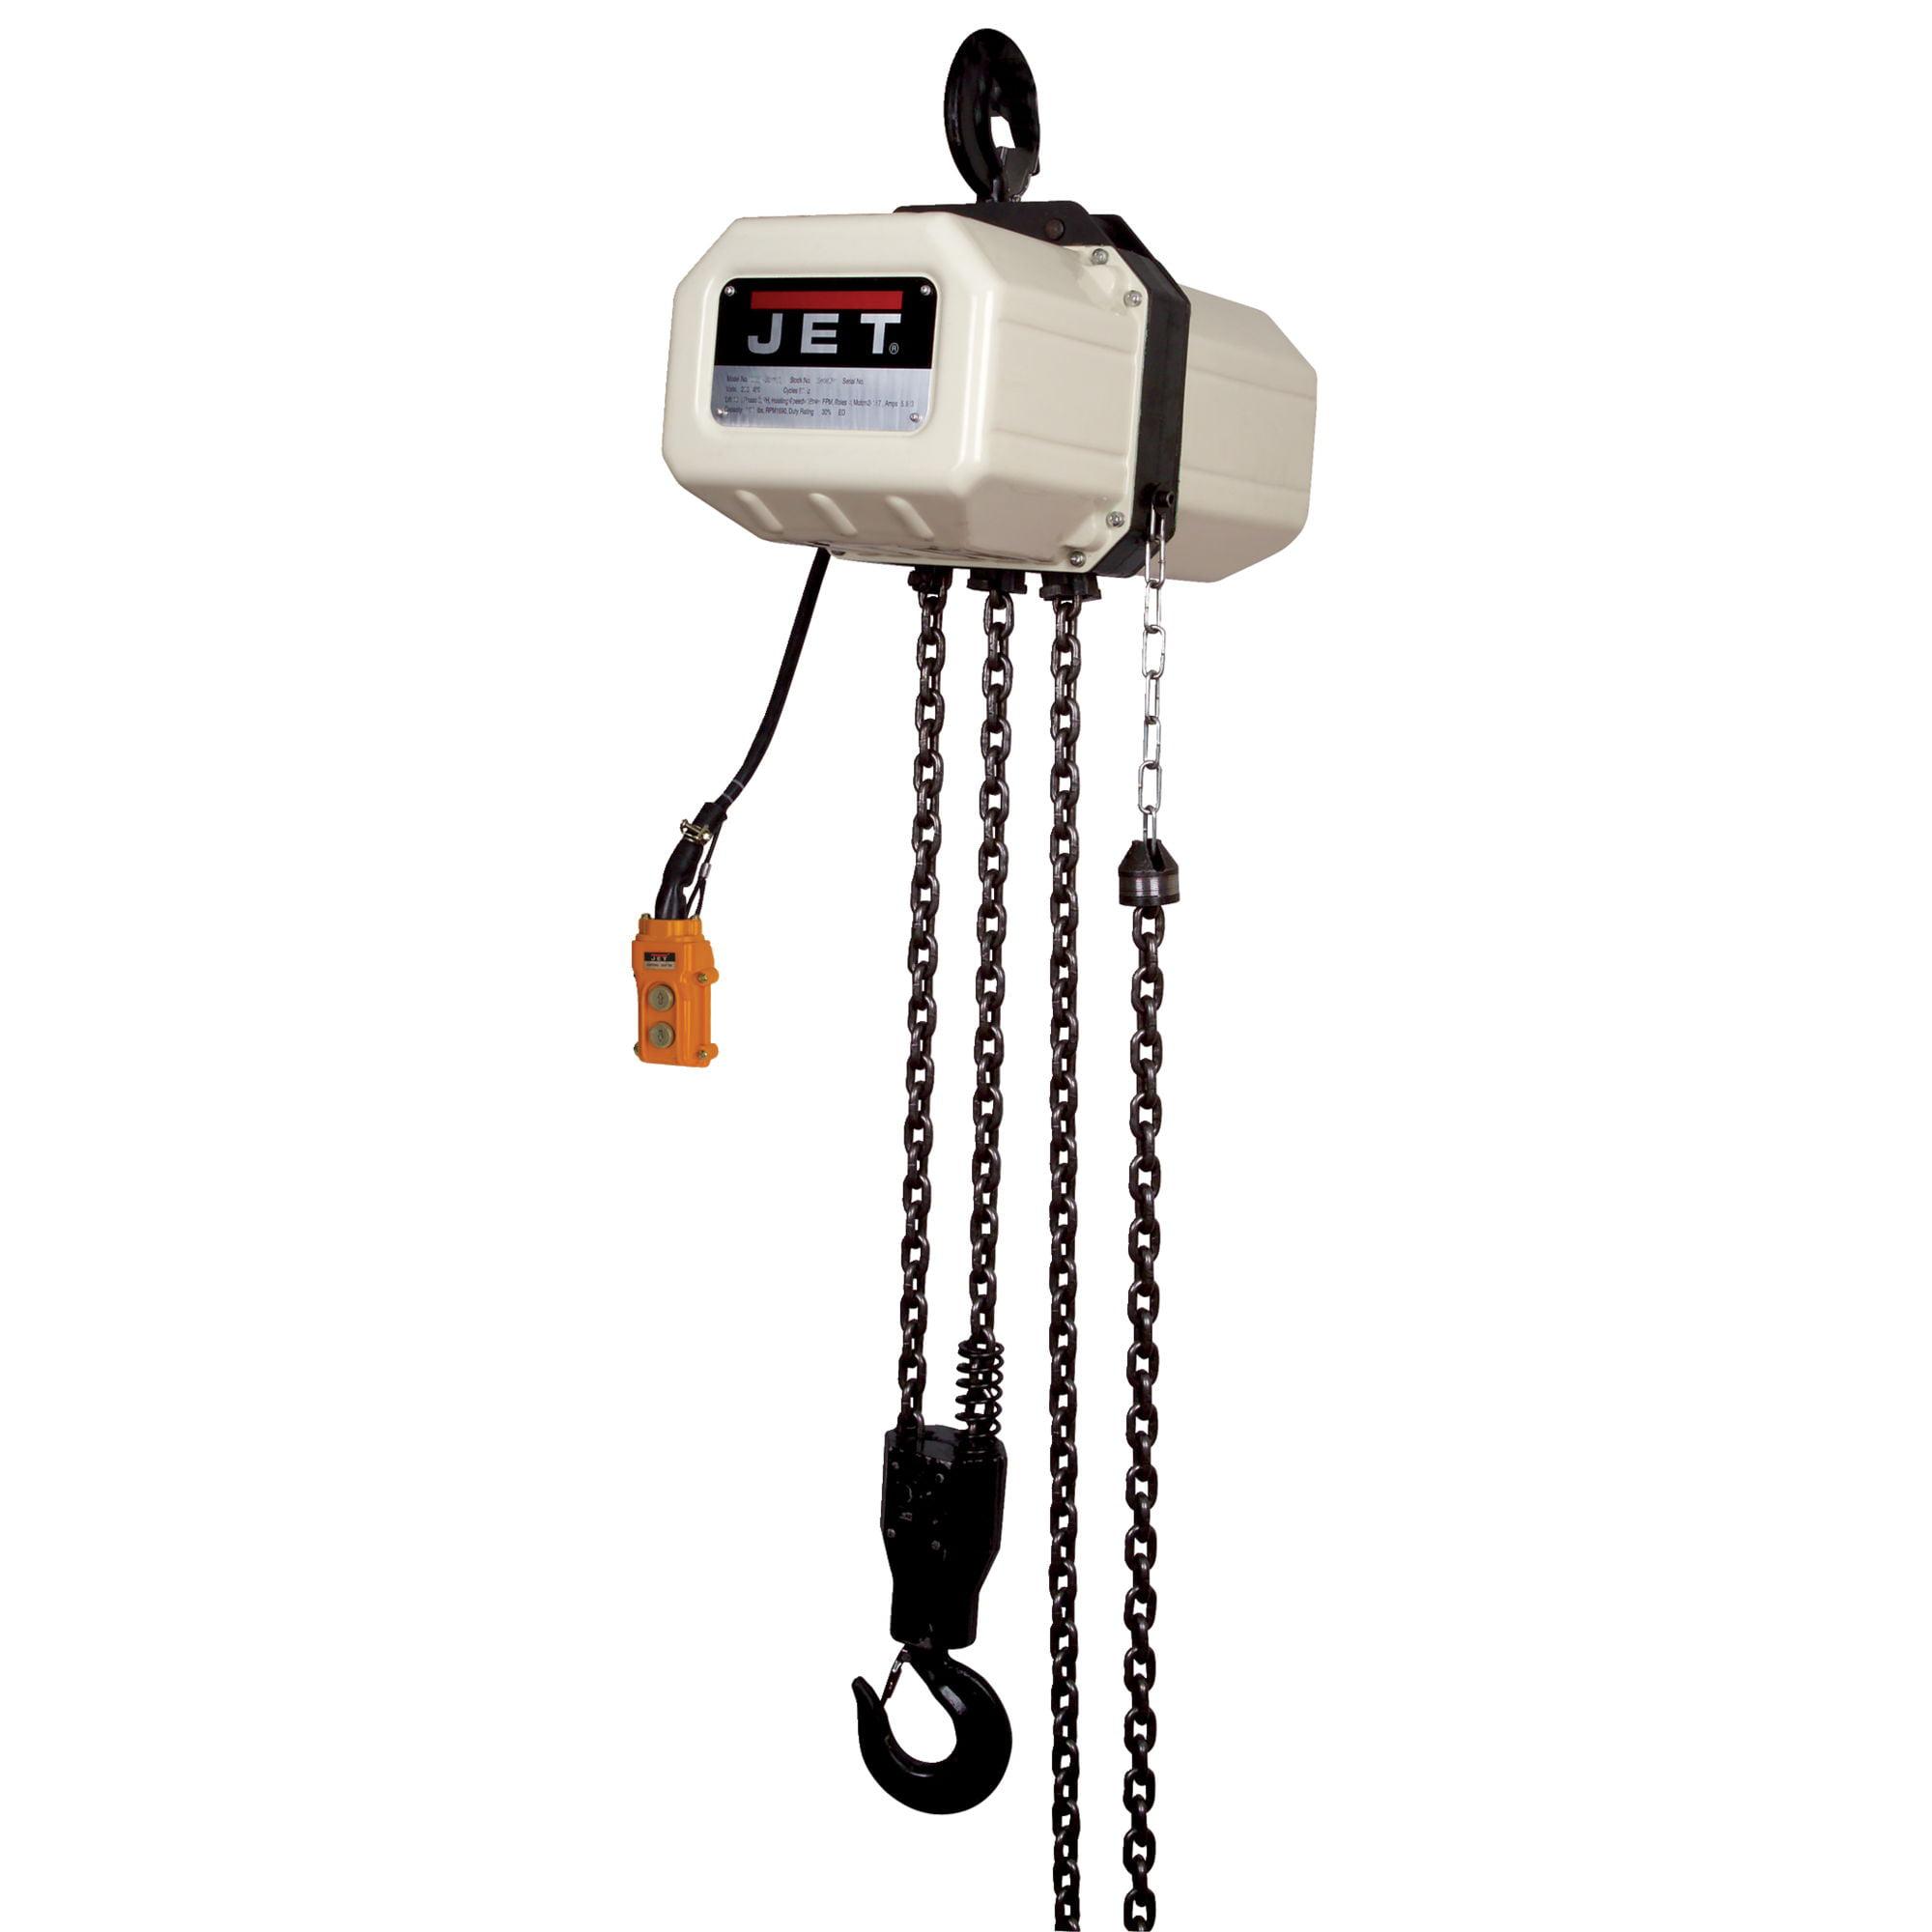 JET 3SS-3C-10 10' Lift Electric Chain Hoist 3 Ton 3PH 230/460V - 331000